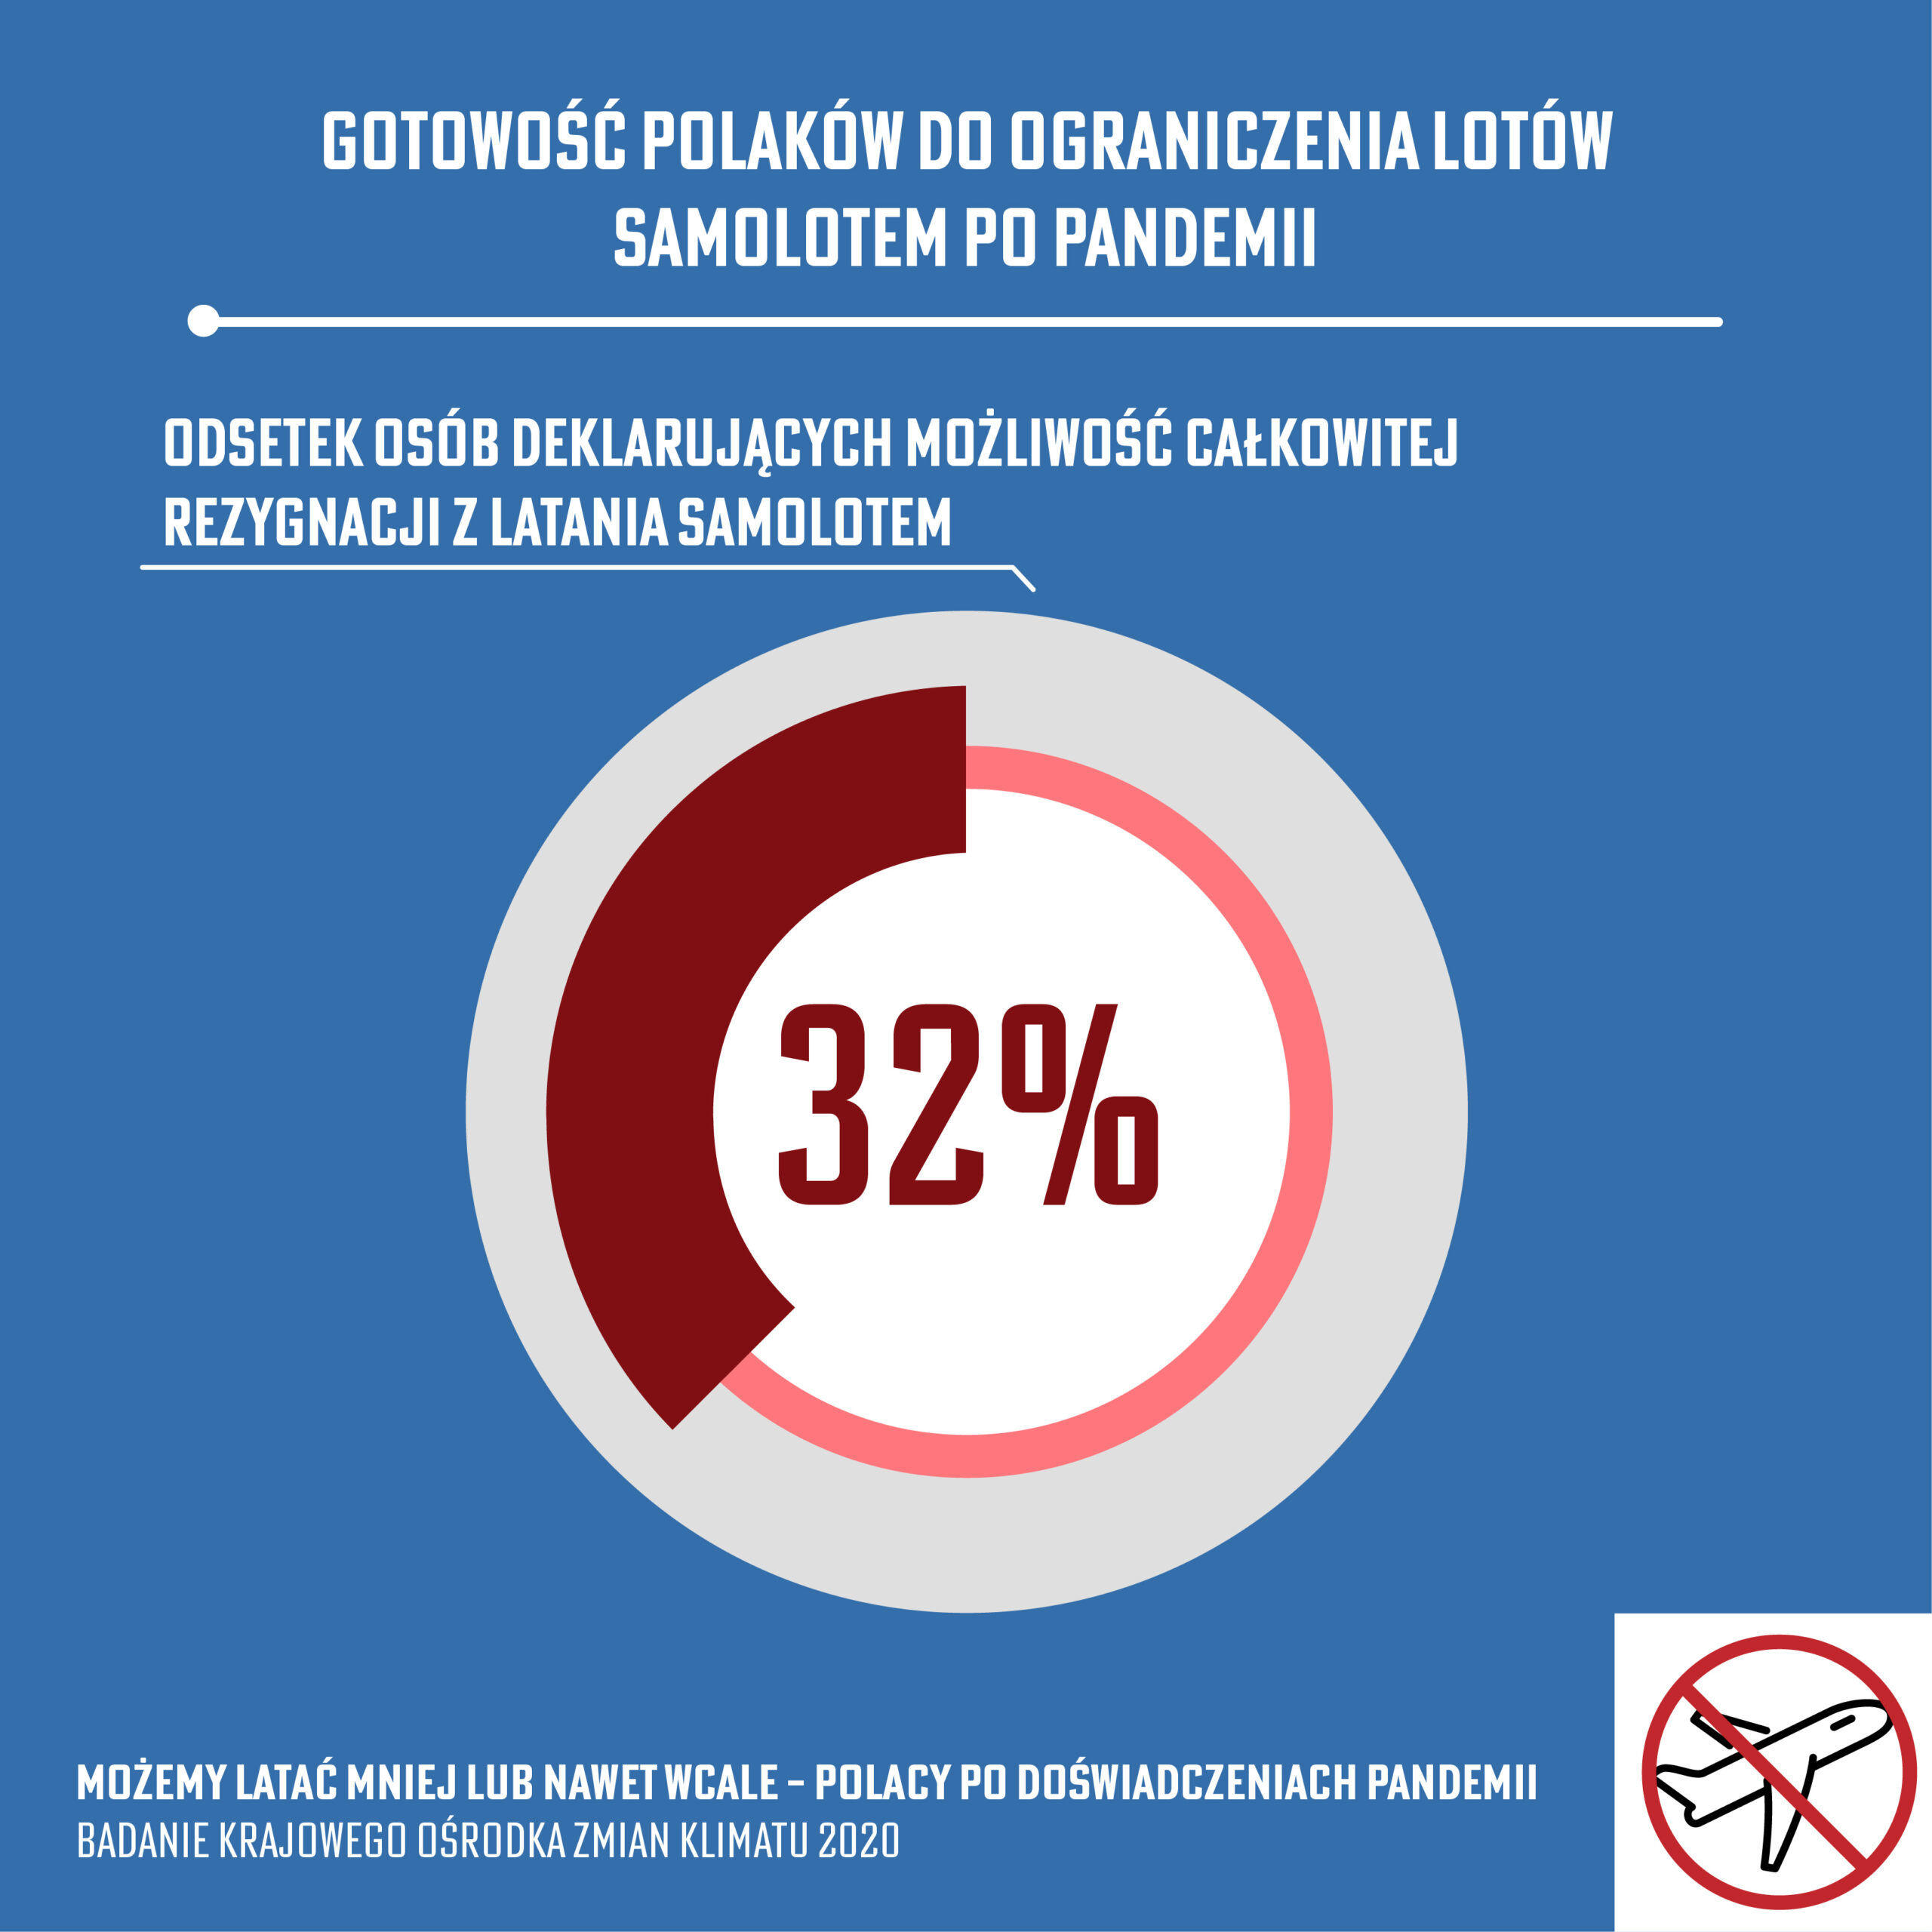 Polak-w-samolocie-a-pandemia_badanie_KOZK_3